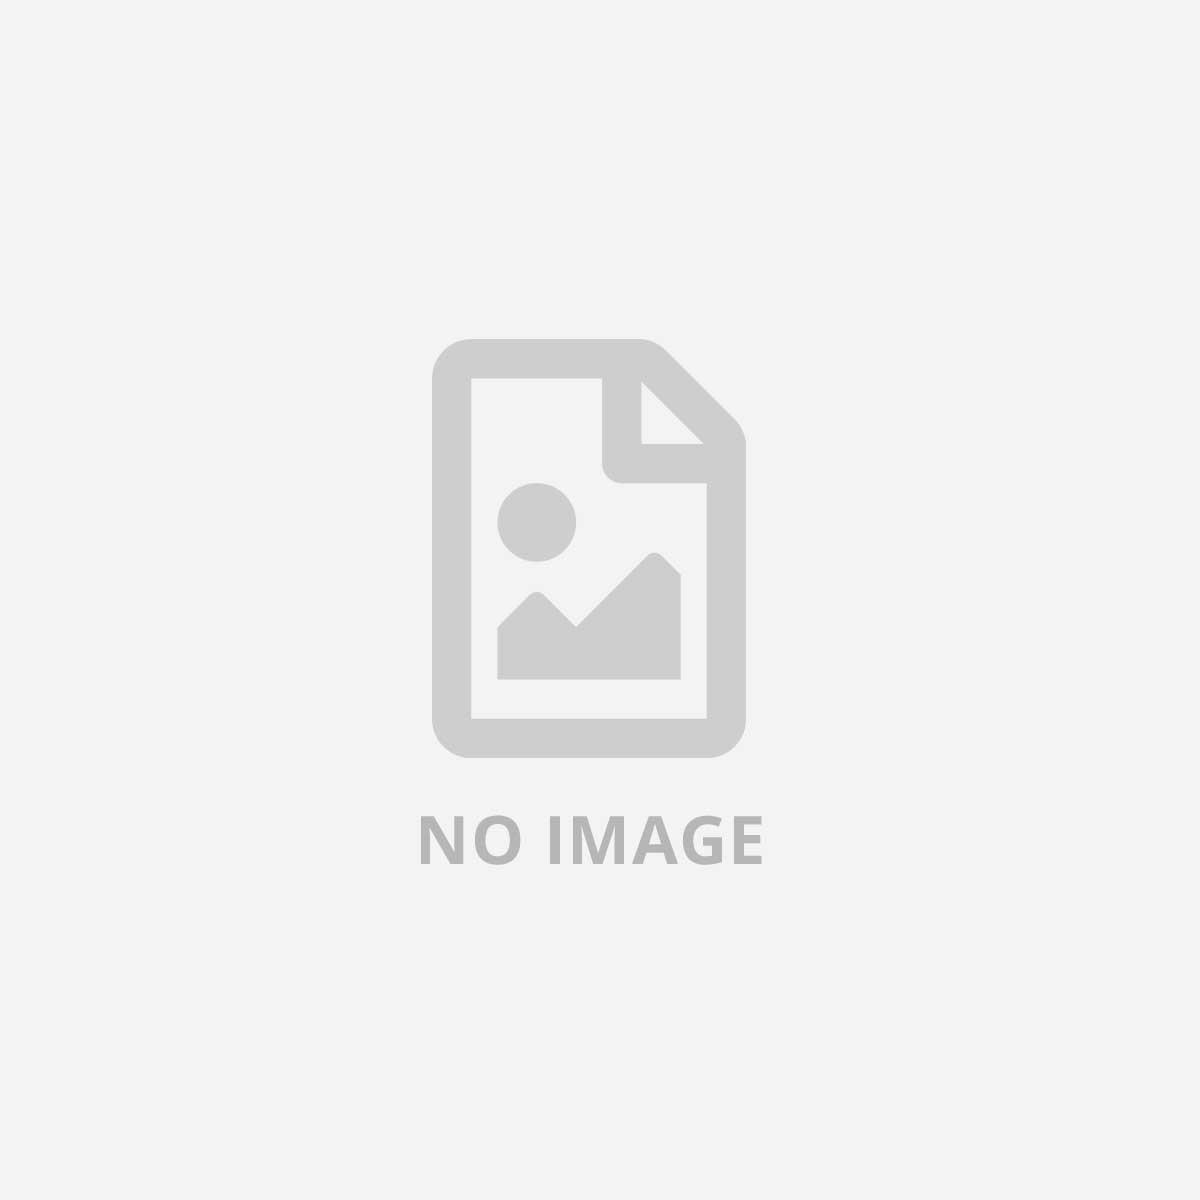 VARIOS DELL T5500 E5620 24GB 256 RIG